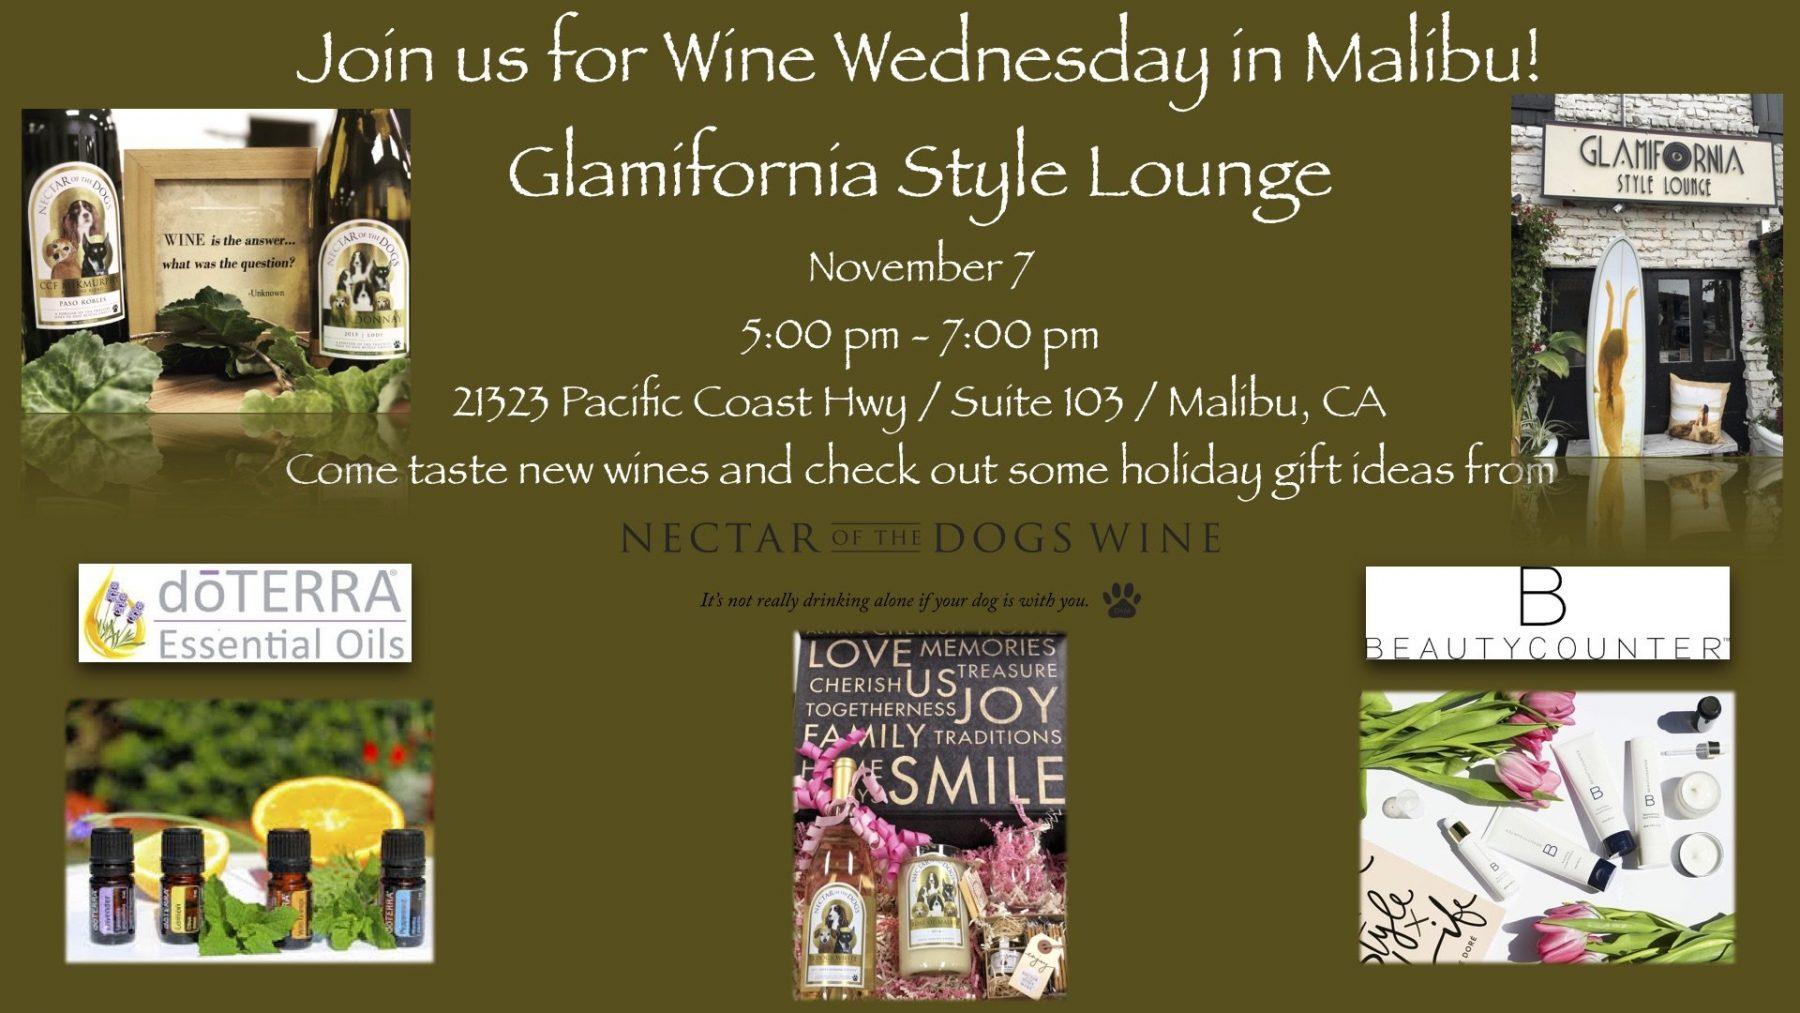 Event flash: Wine Tasting Wednesday